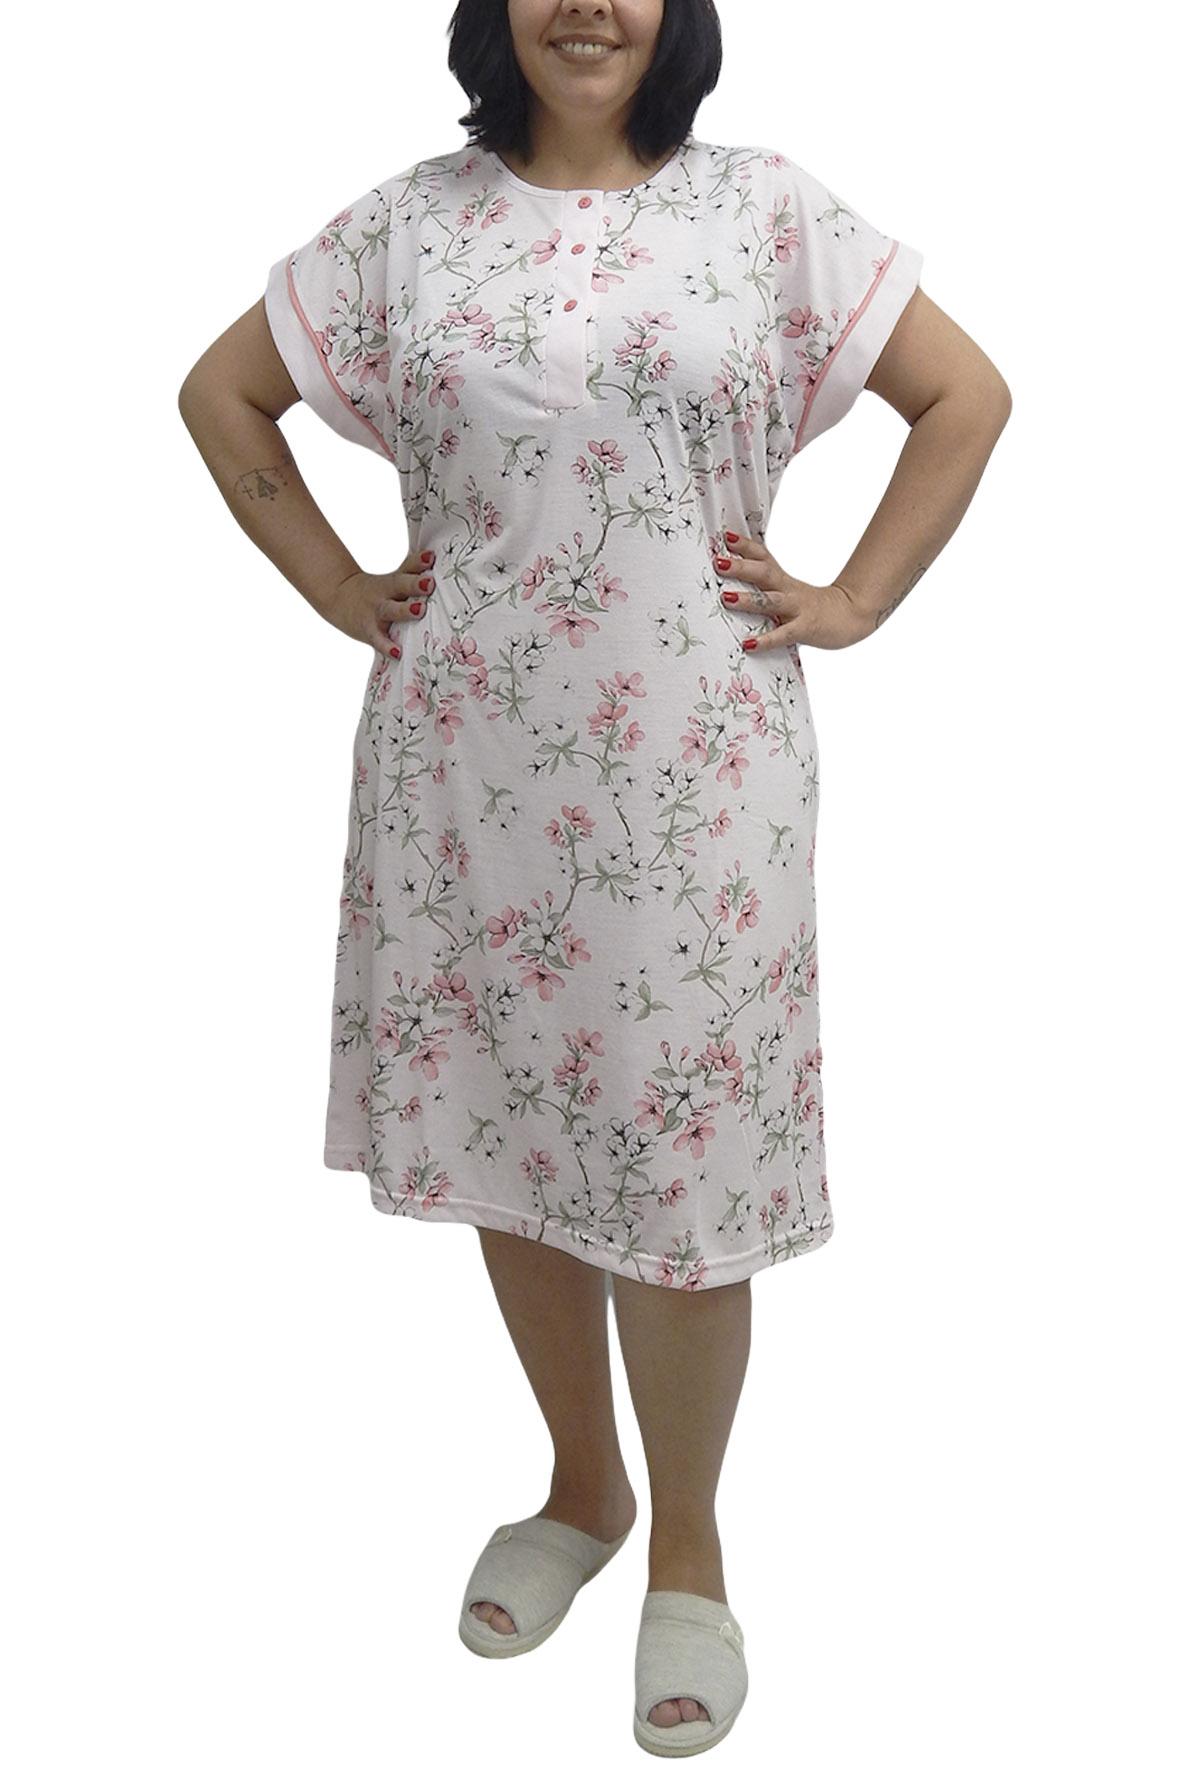 Camisola Manga Curta Semi Aberta com Estampa Floral - Rosemari